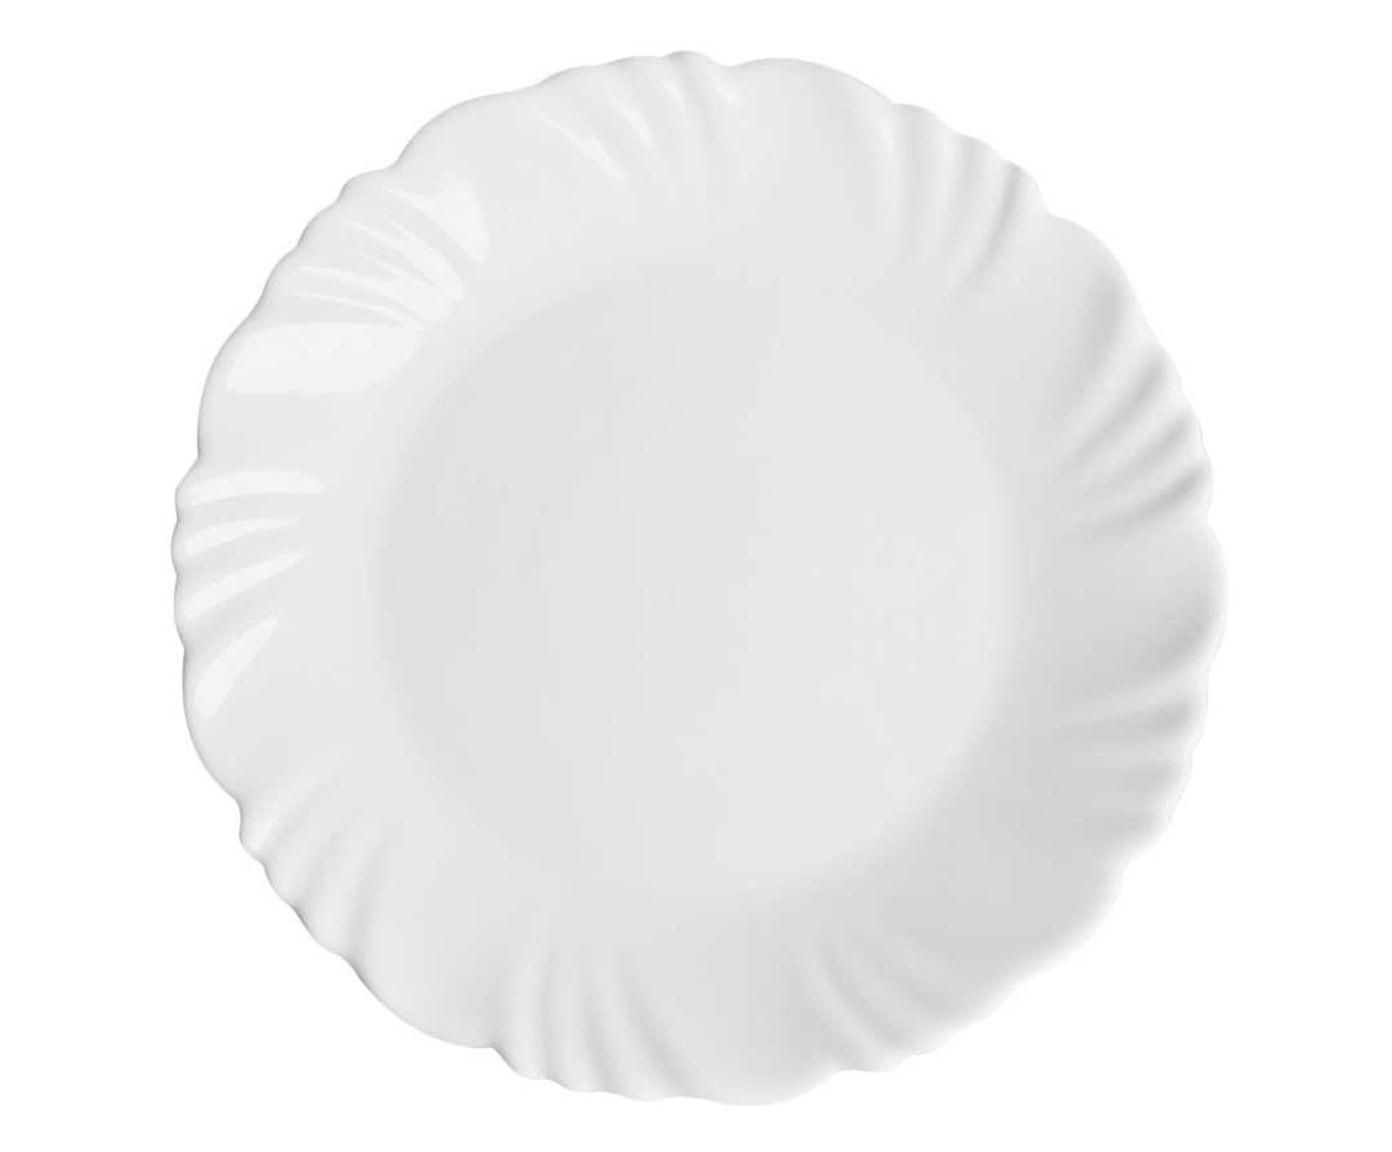 Prato para Sobremesa Bott | Westwing.com.br